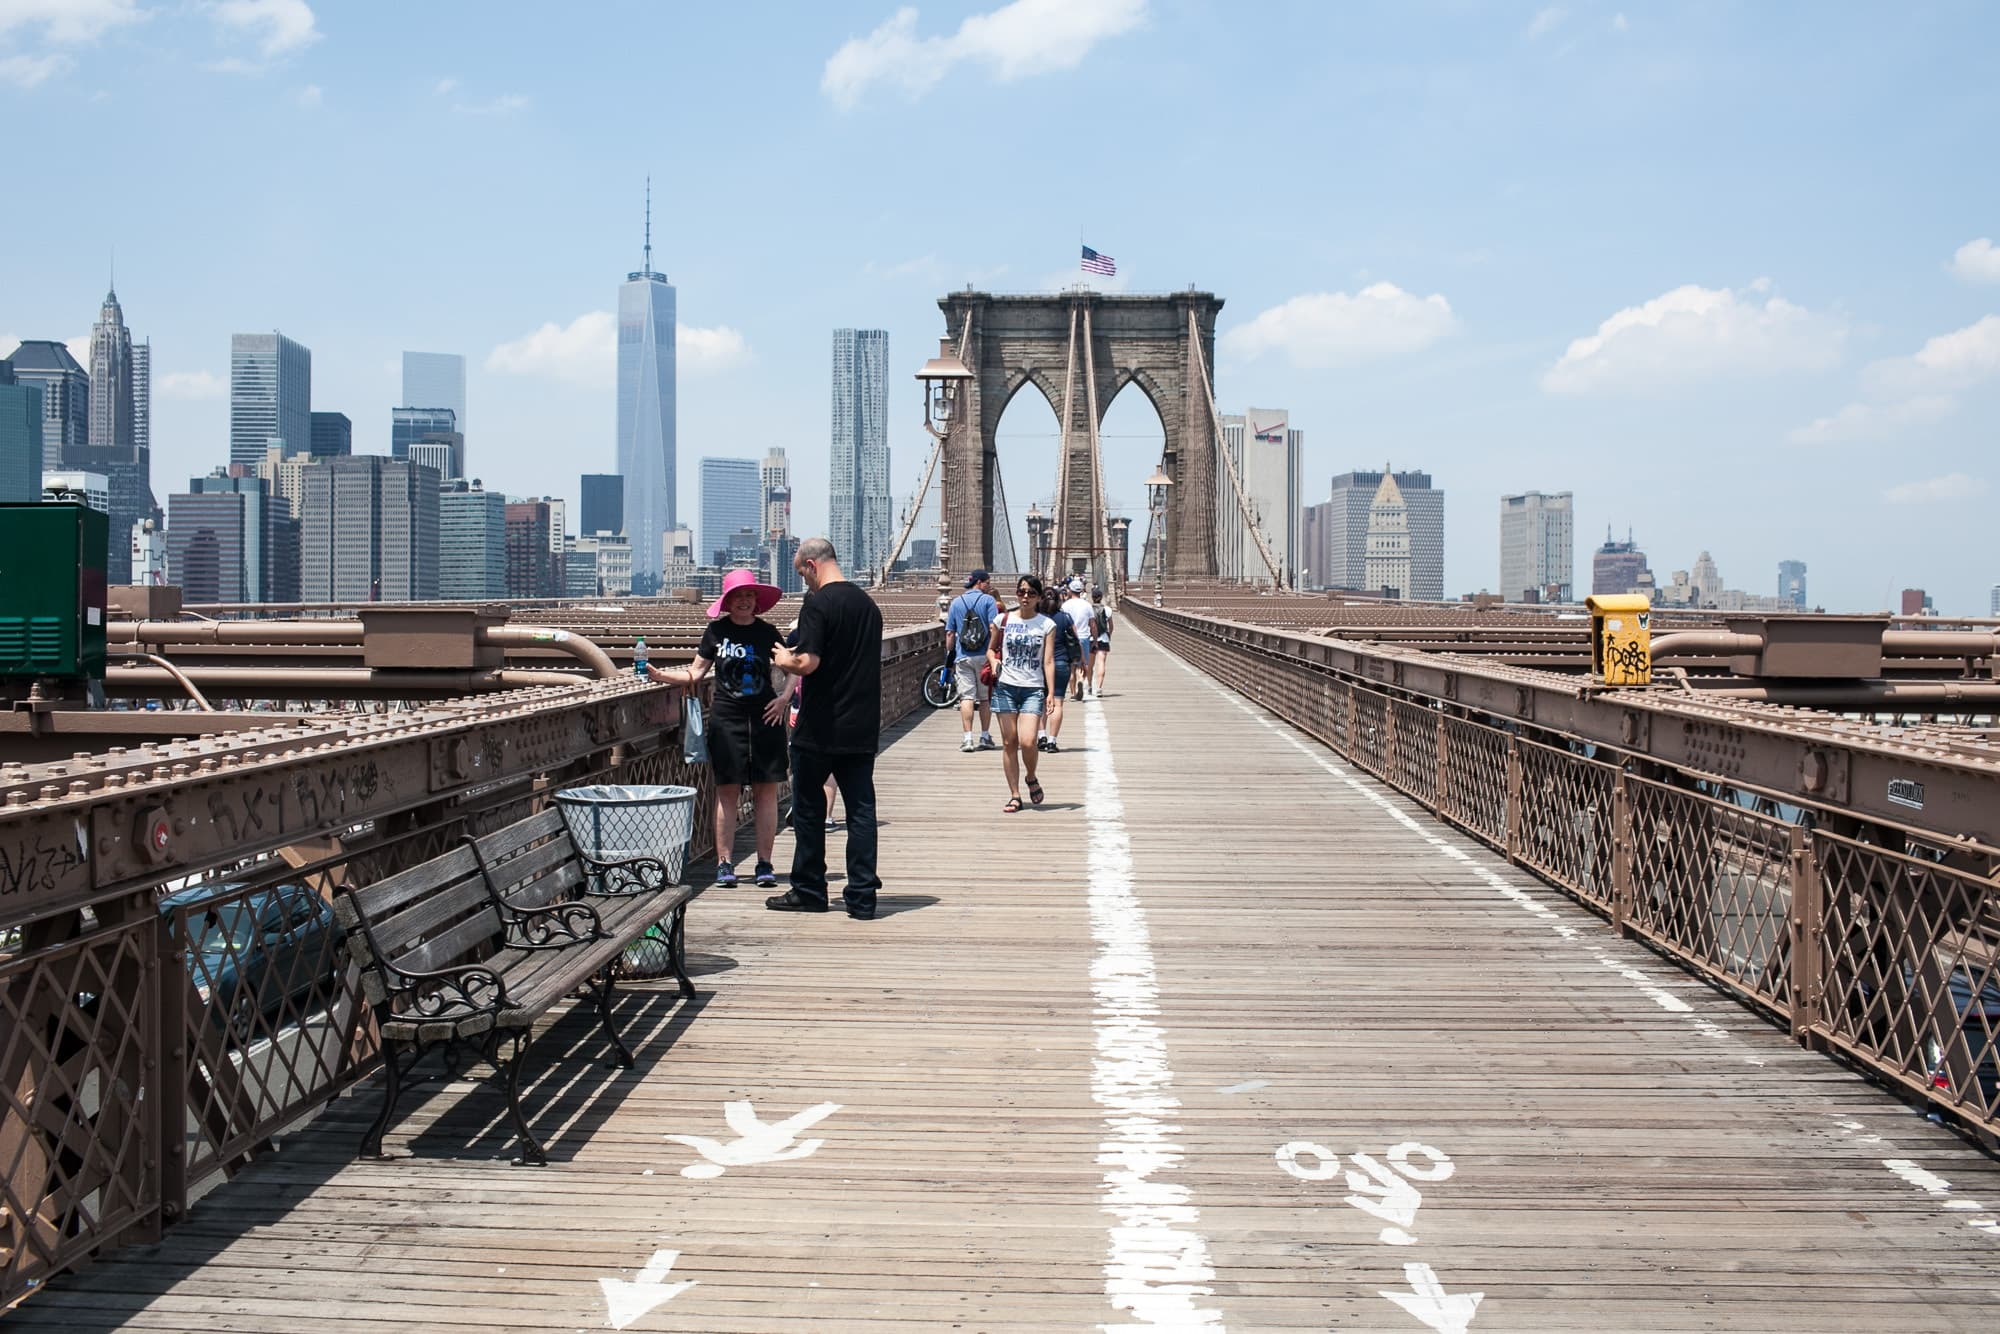 Life List #183: Walk across the Brooklyn Bridge. • Choosing Figs